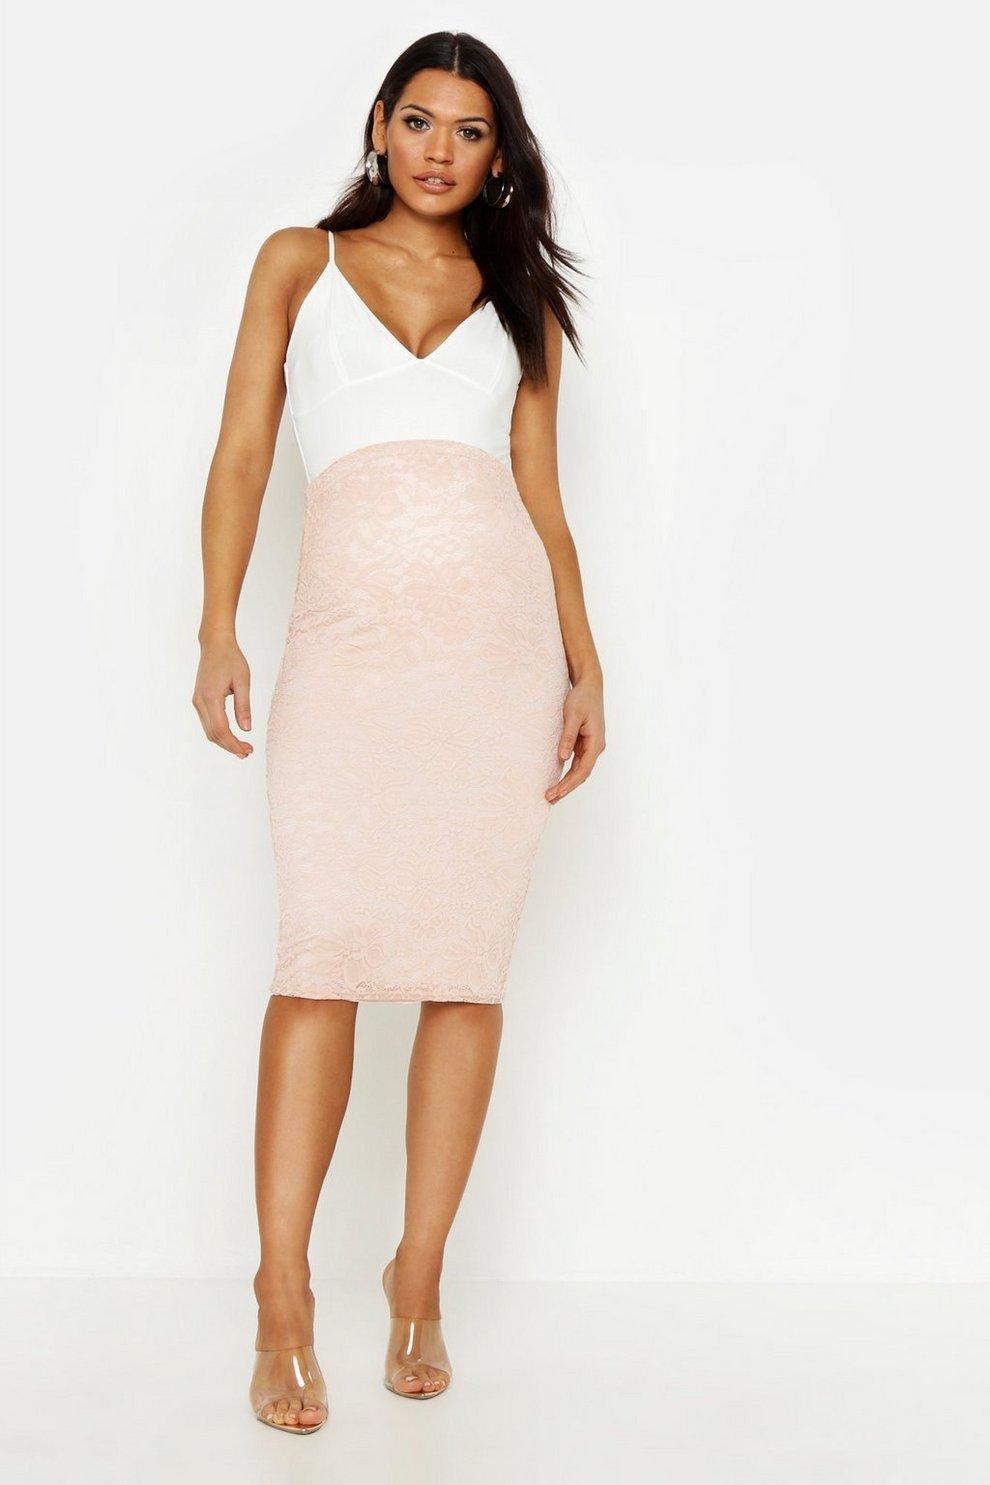 6f90988055cb7 Womens Nude Maternity Lace Midi Skirt